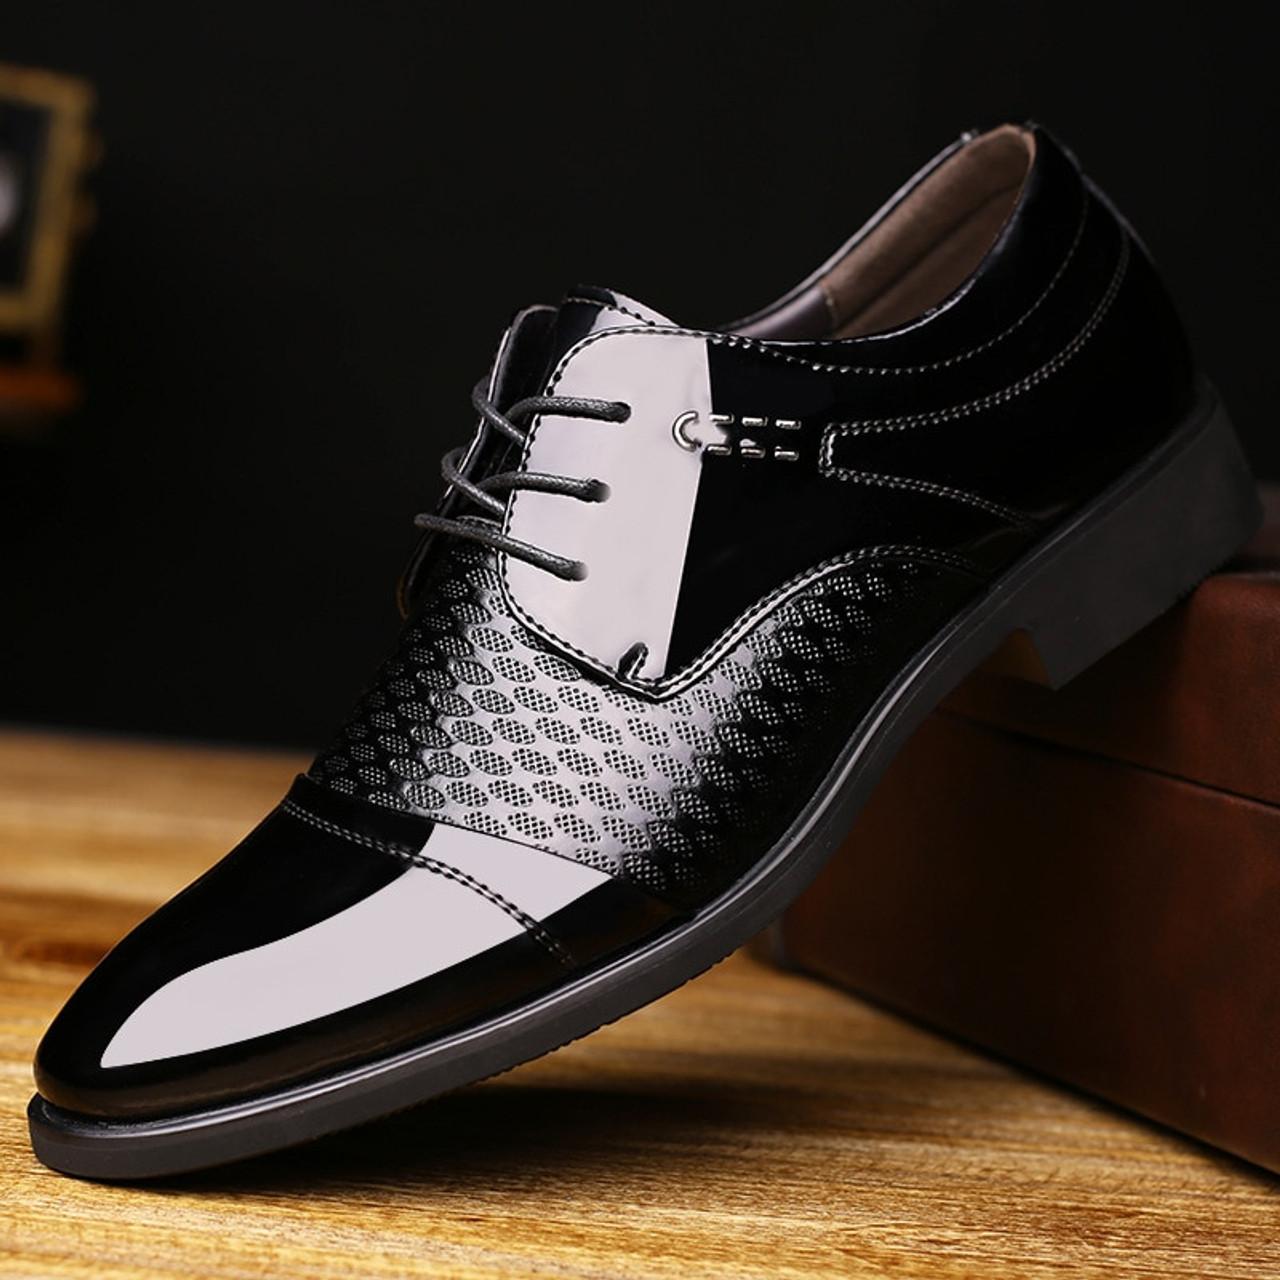 Breathable Pointed Toe Oxford Men s Footwear Formal Dress Shoes Man 2018  Summer Elegant Suit Shoe Black Brown Wedding Shoes - OnshopDeals.Com 7d0e7925c9bb